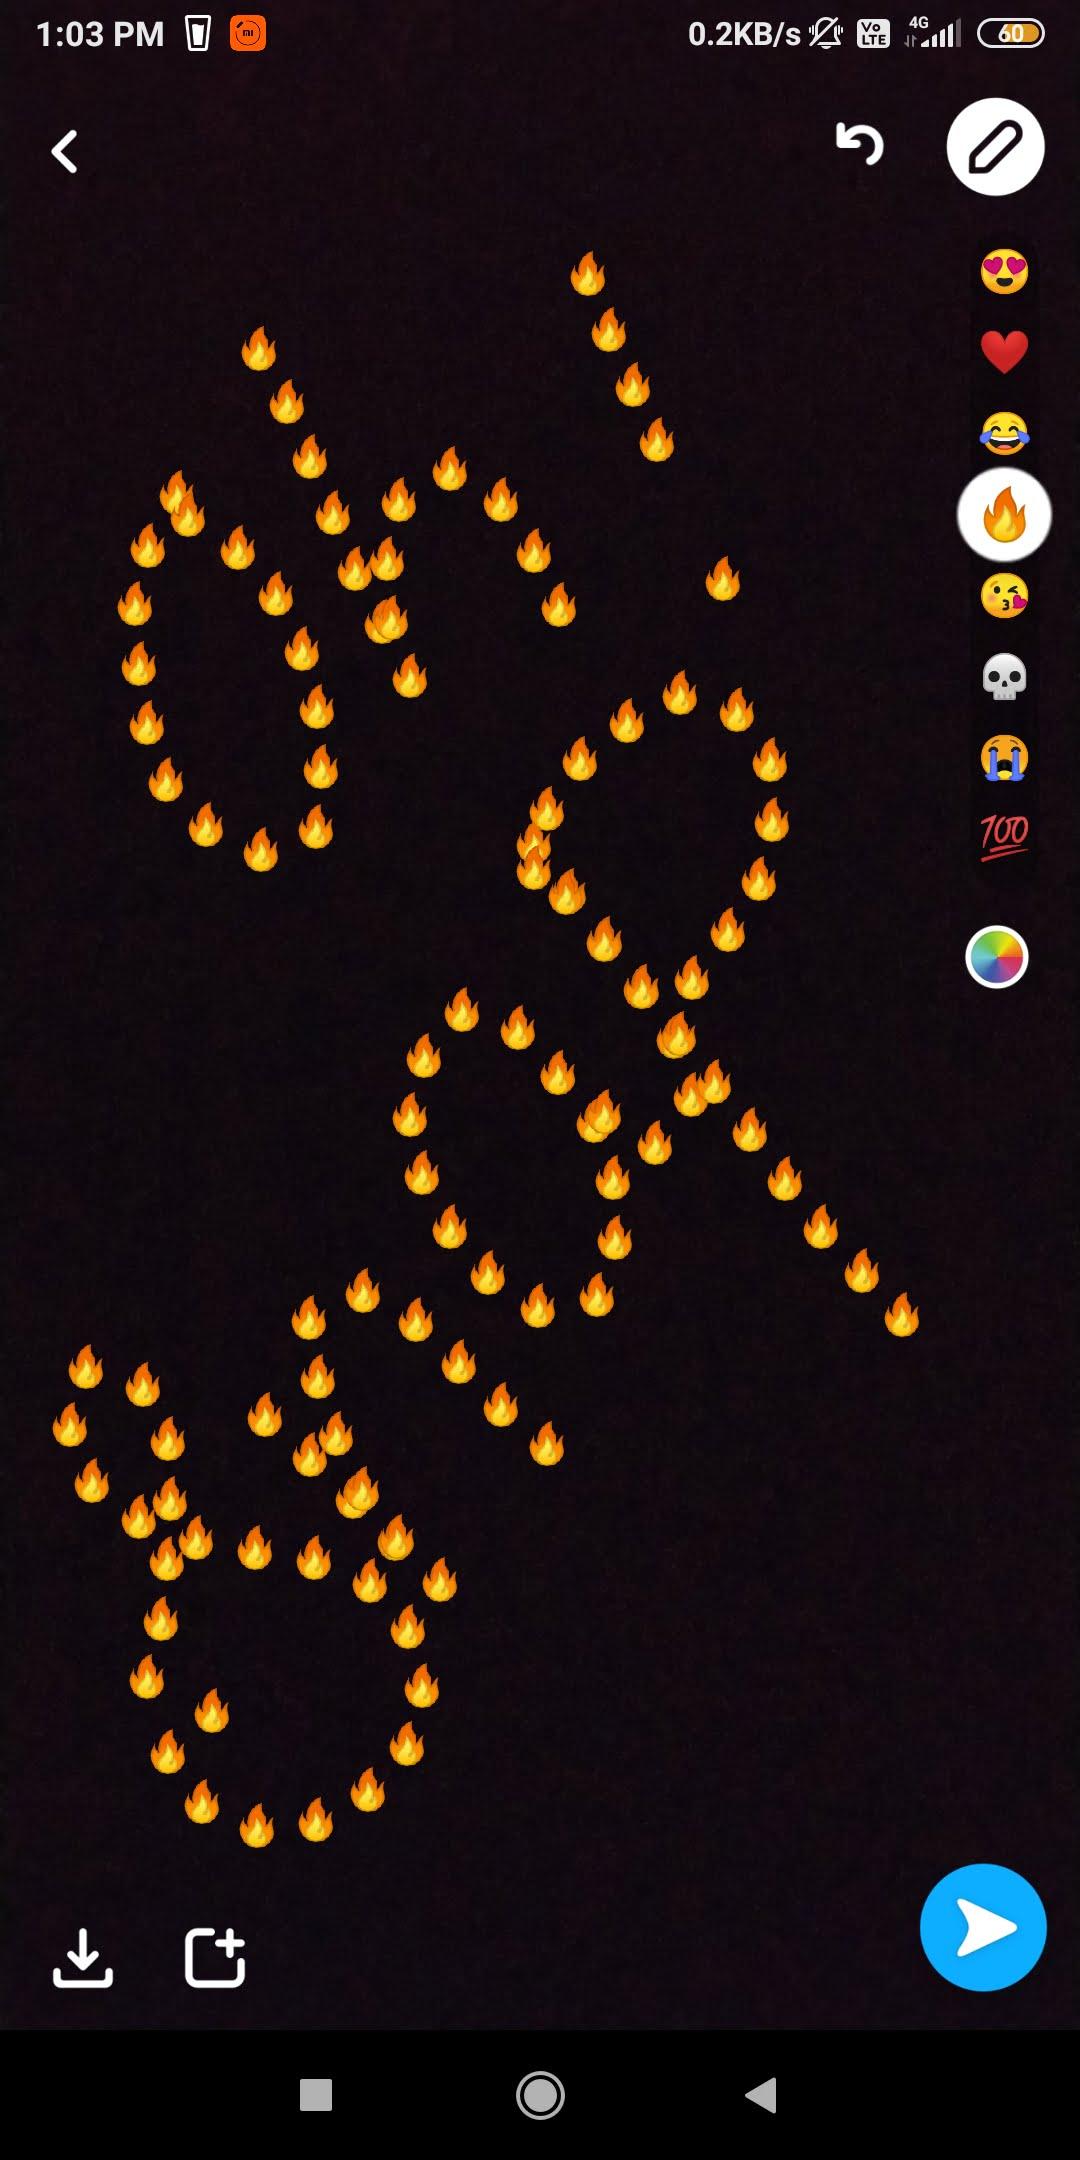 Drawing Emojis  - Drawing emojis - 31 Best SNAPCHAT HACKS, Features & Tricks 2021